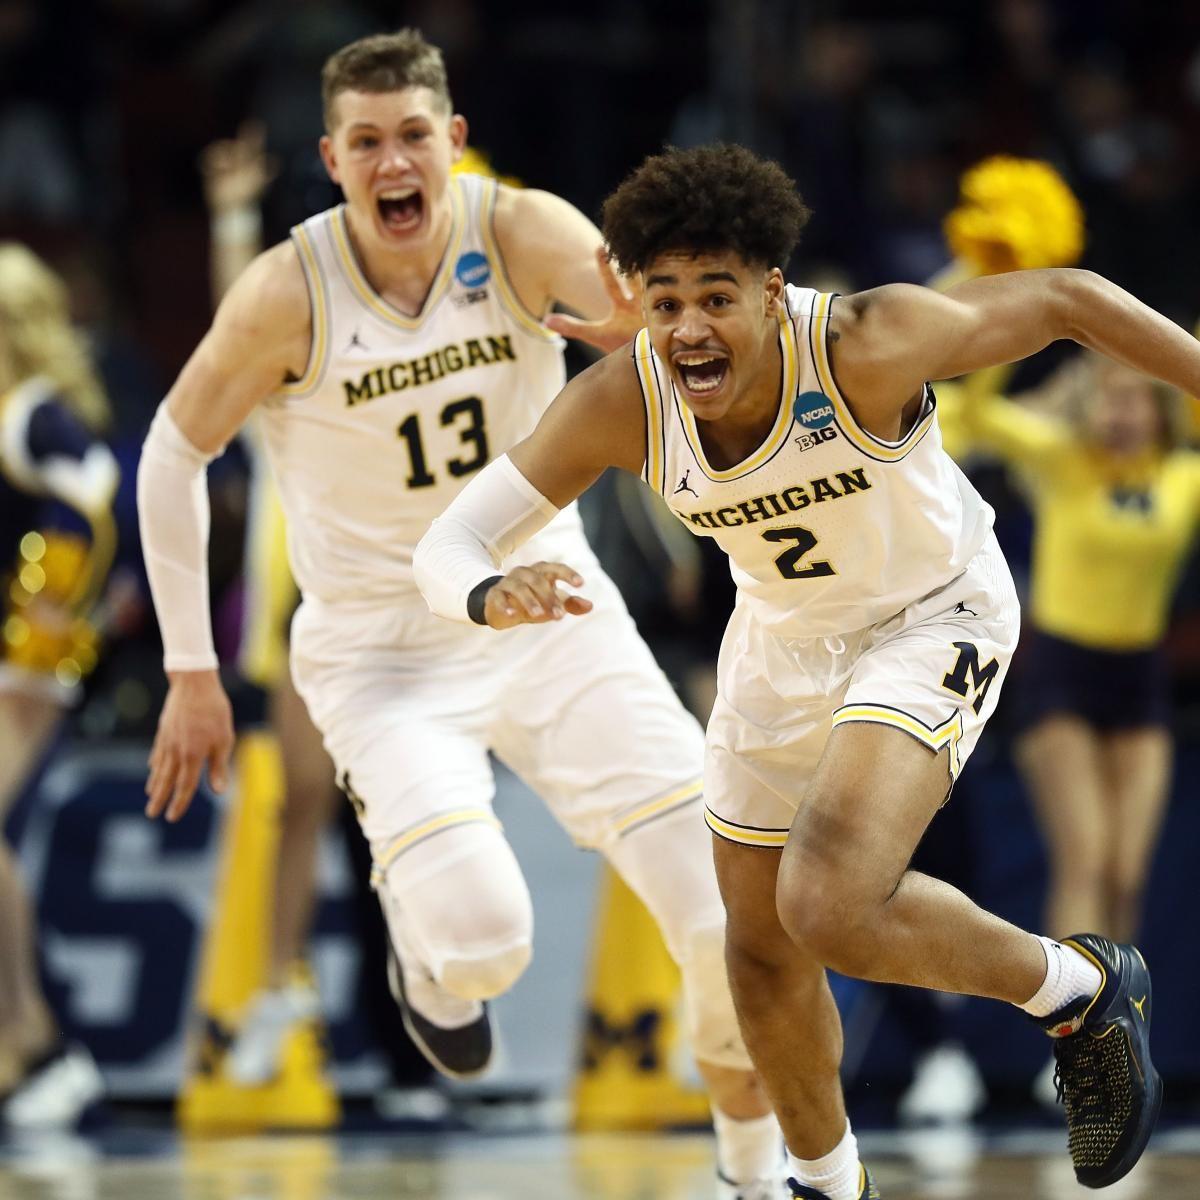 Michigan's Jordan Poole Hit BuzzerBeater Identical to